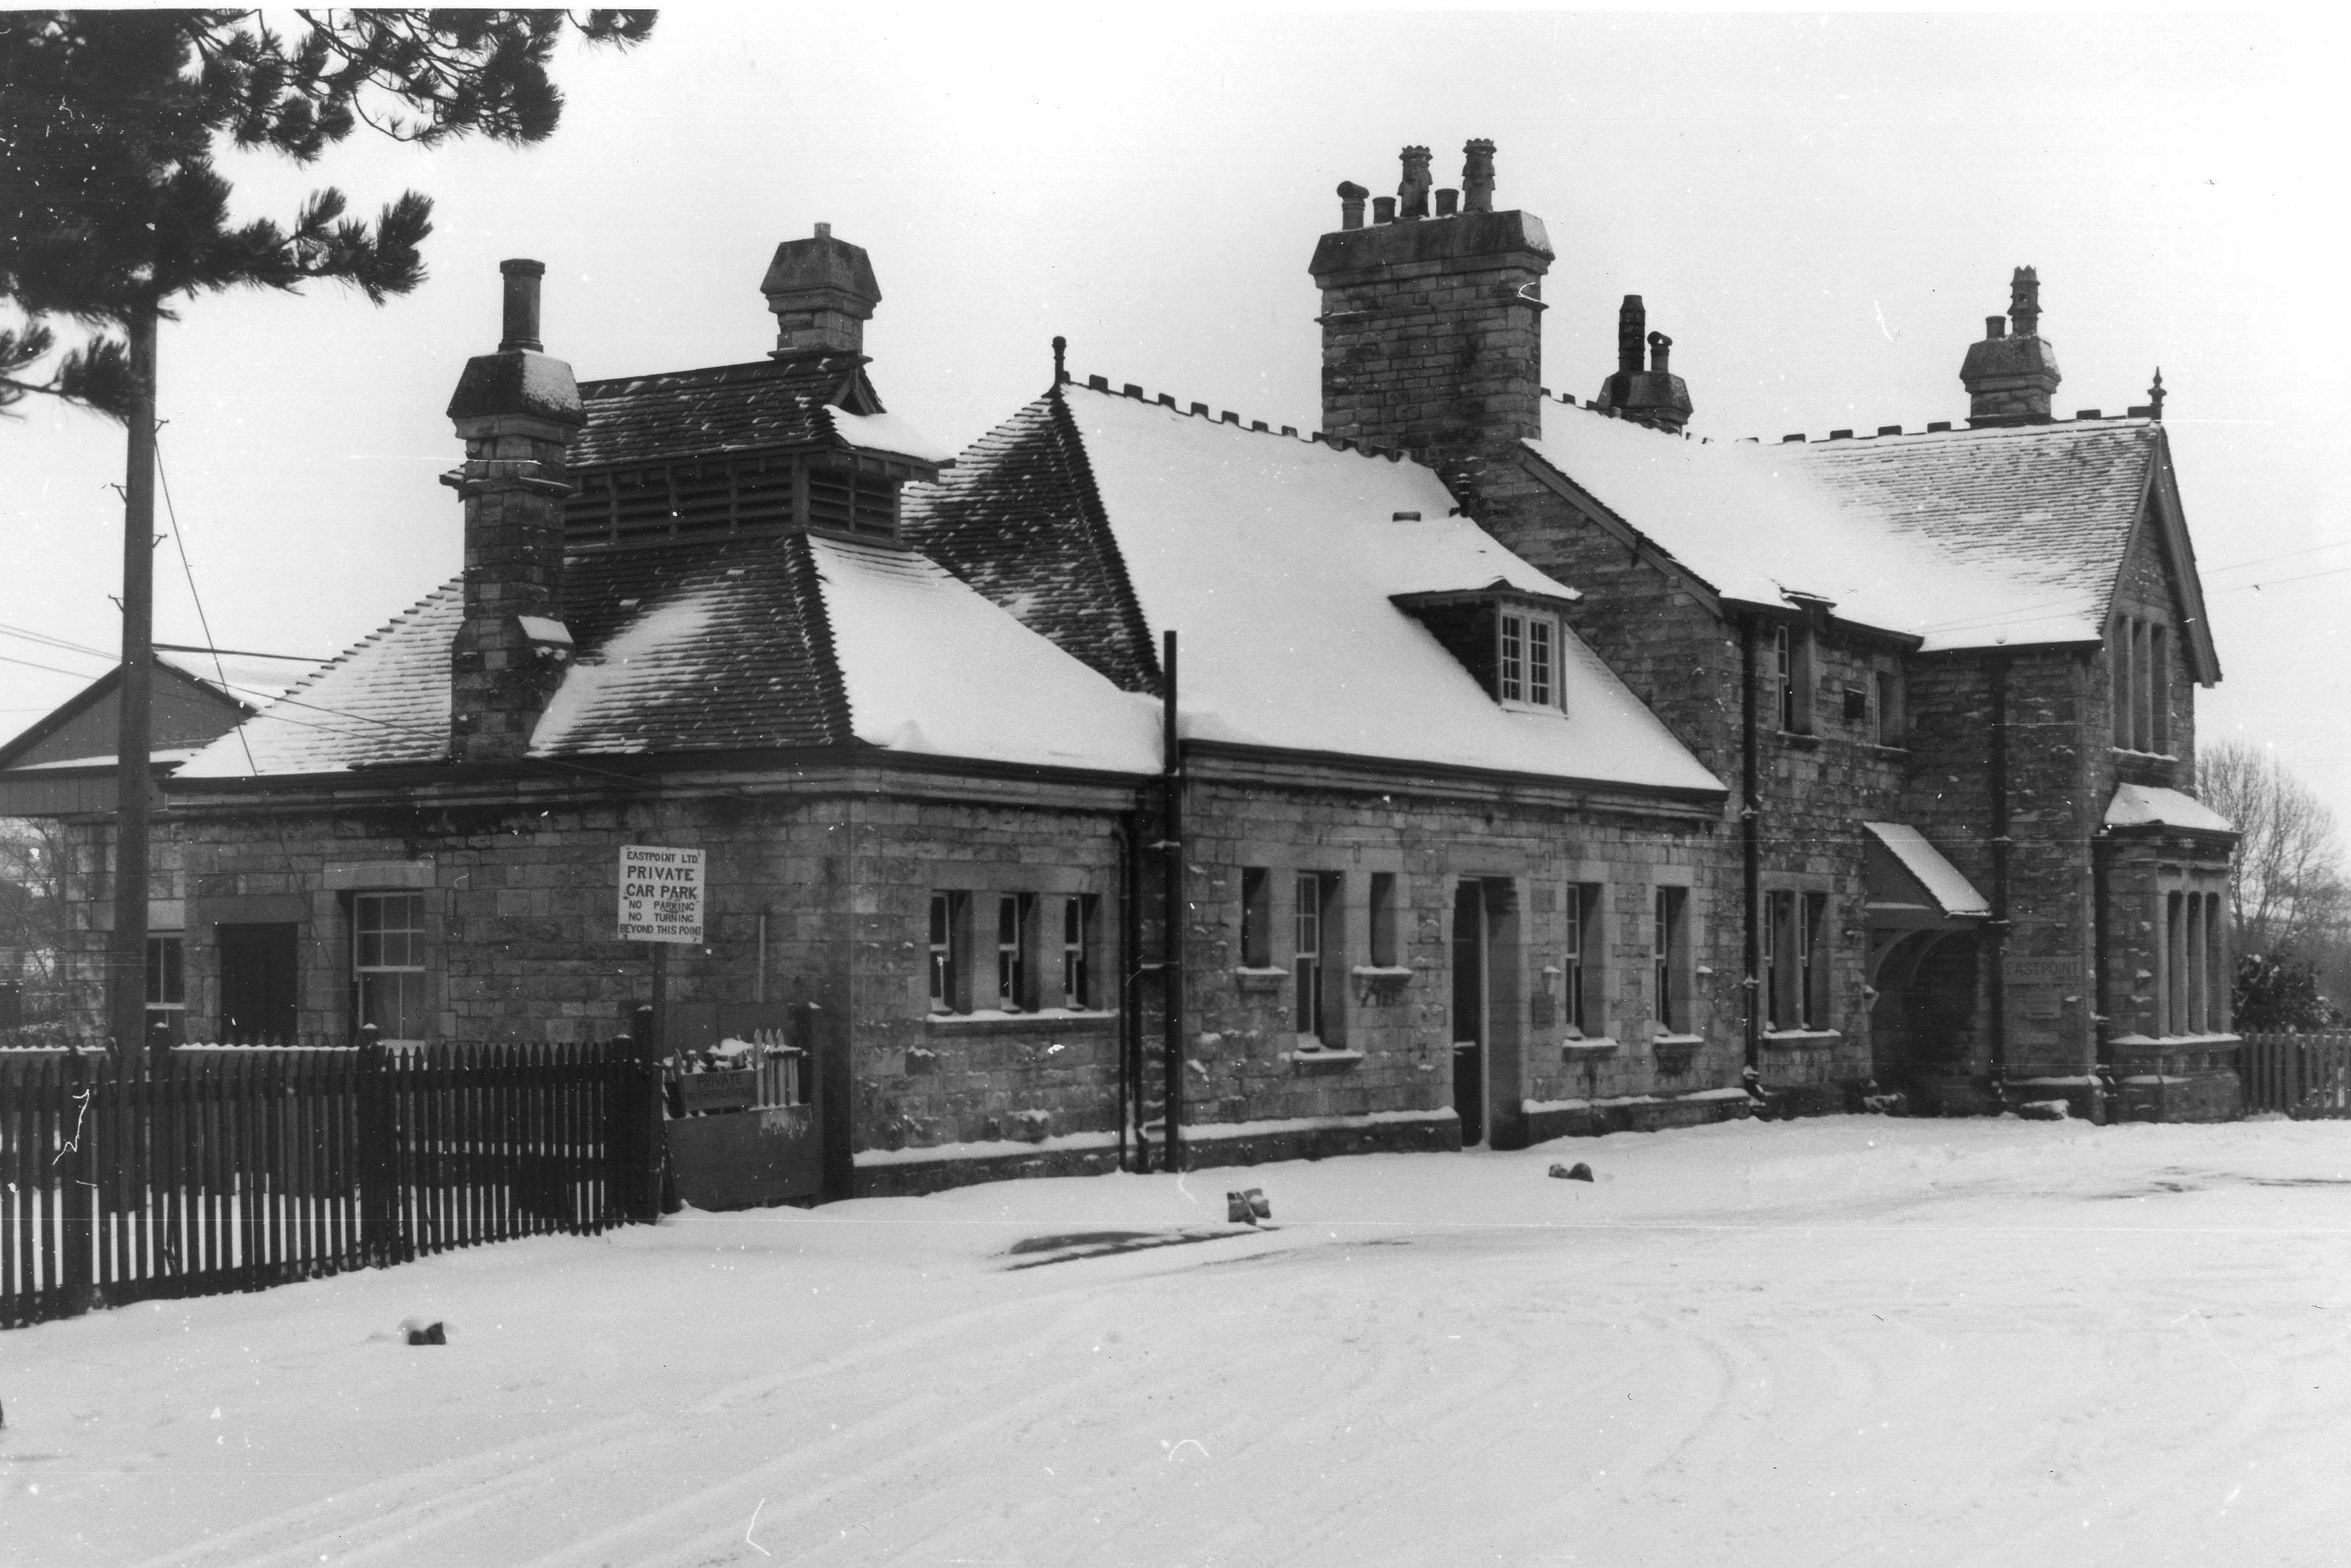 Station + snow